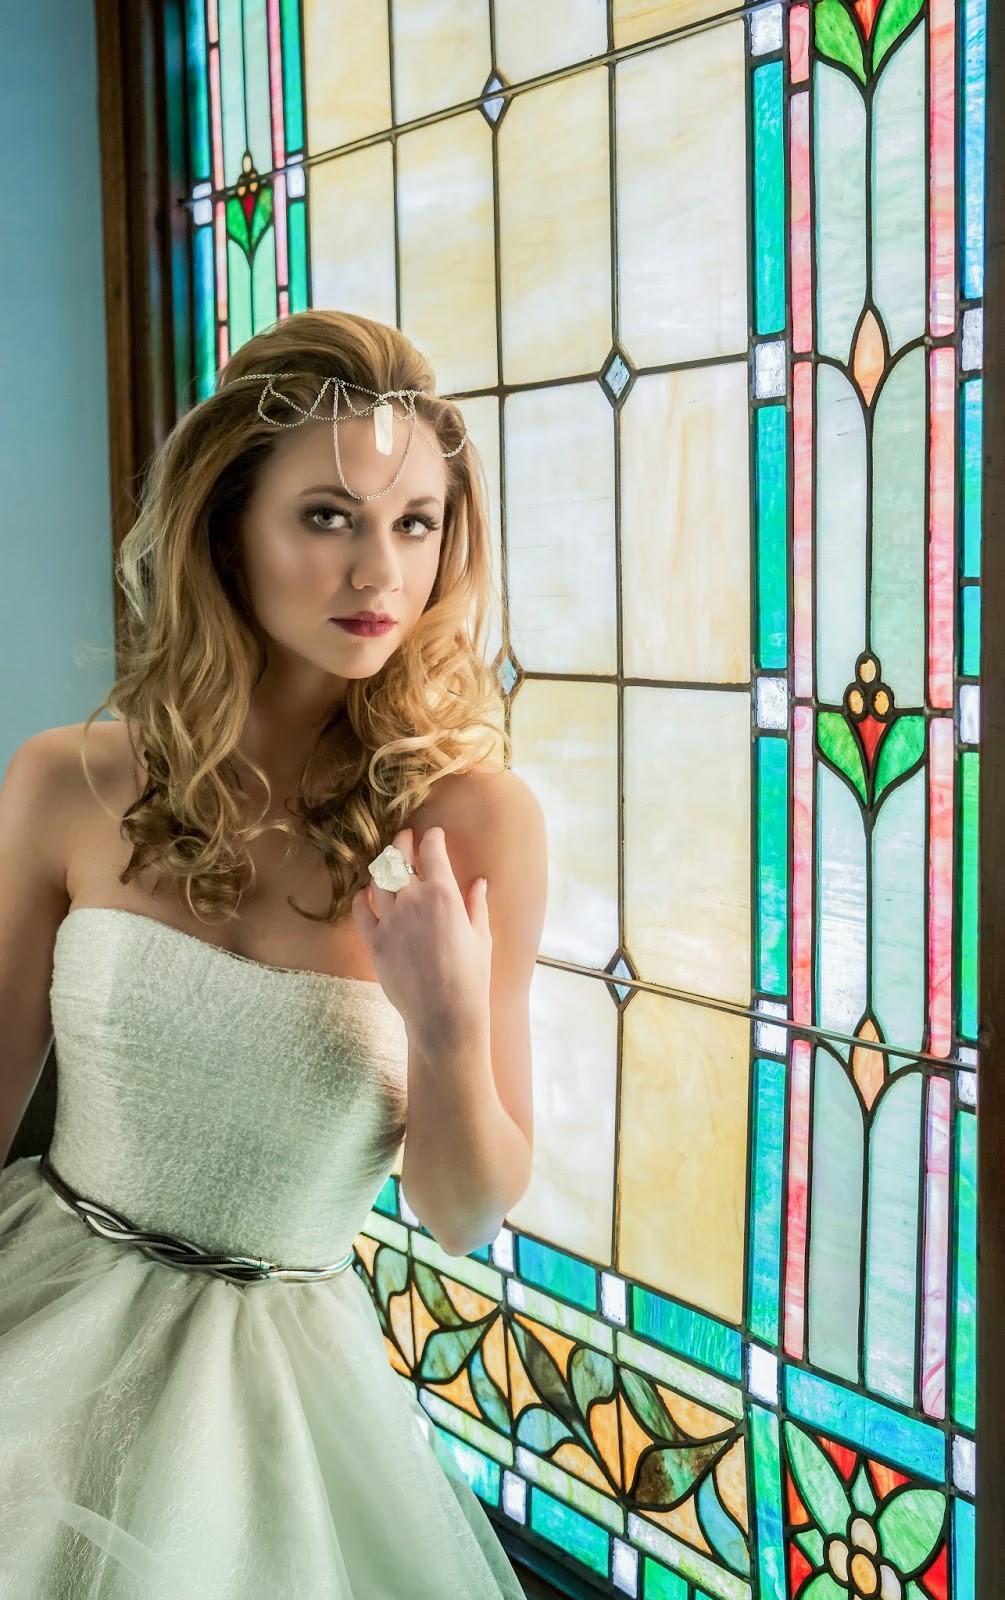 6ad24a1096 Photographer  Cam Wood - Model  Vicki-Numa Models - MUA  Nicole Saxton Hair  Stylist  Stephanie Van Tassell Fashion Stylist  Elena Harrison-Style Concept